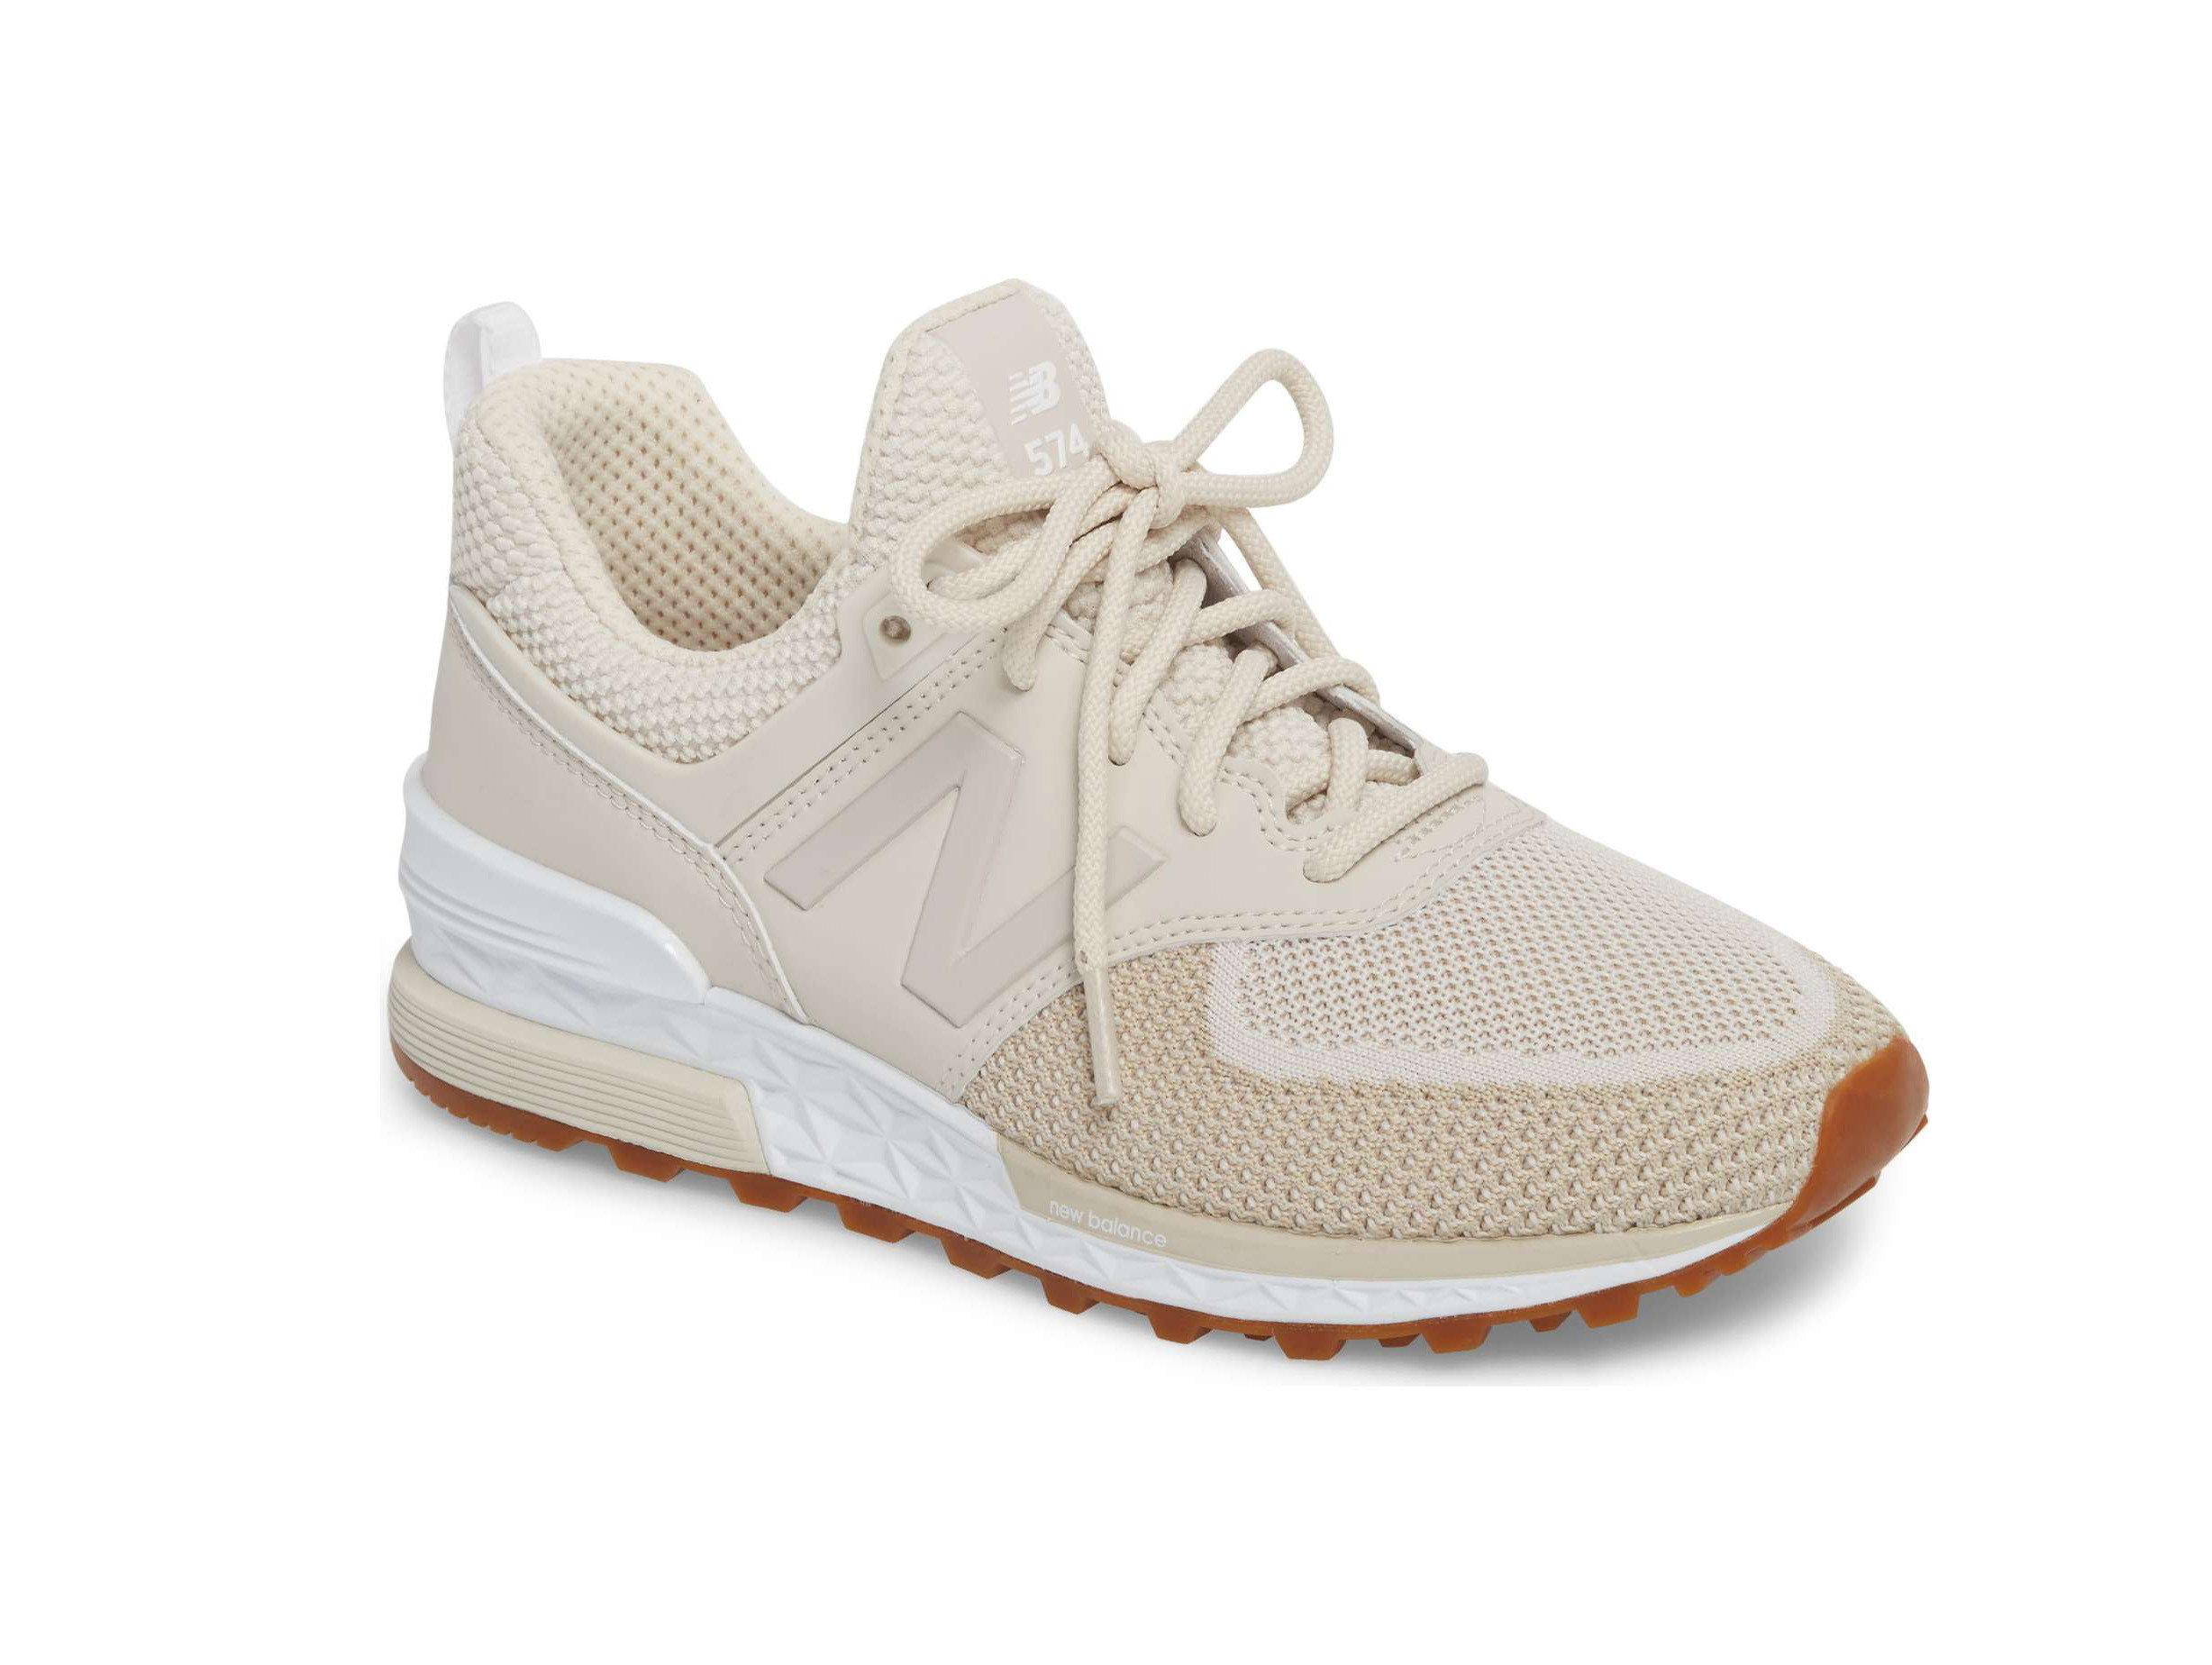 Health + Wellness Style + Design Travel Shop footwear white shoe walking shoe sportswear running shoe beige outdoor shoe product cross training shoe tennis shoe product design sneakers athletic shoe